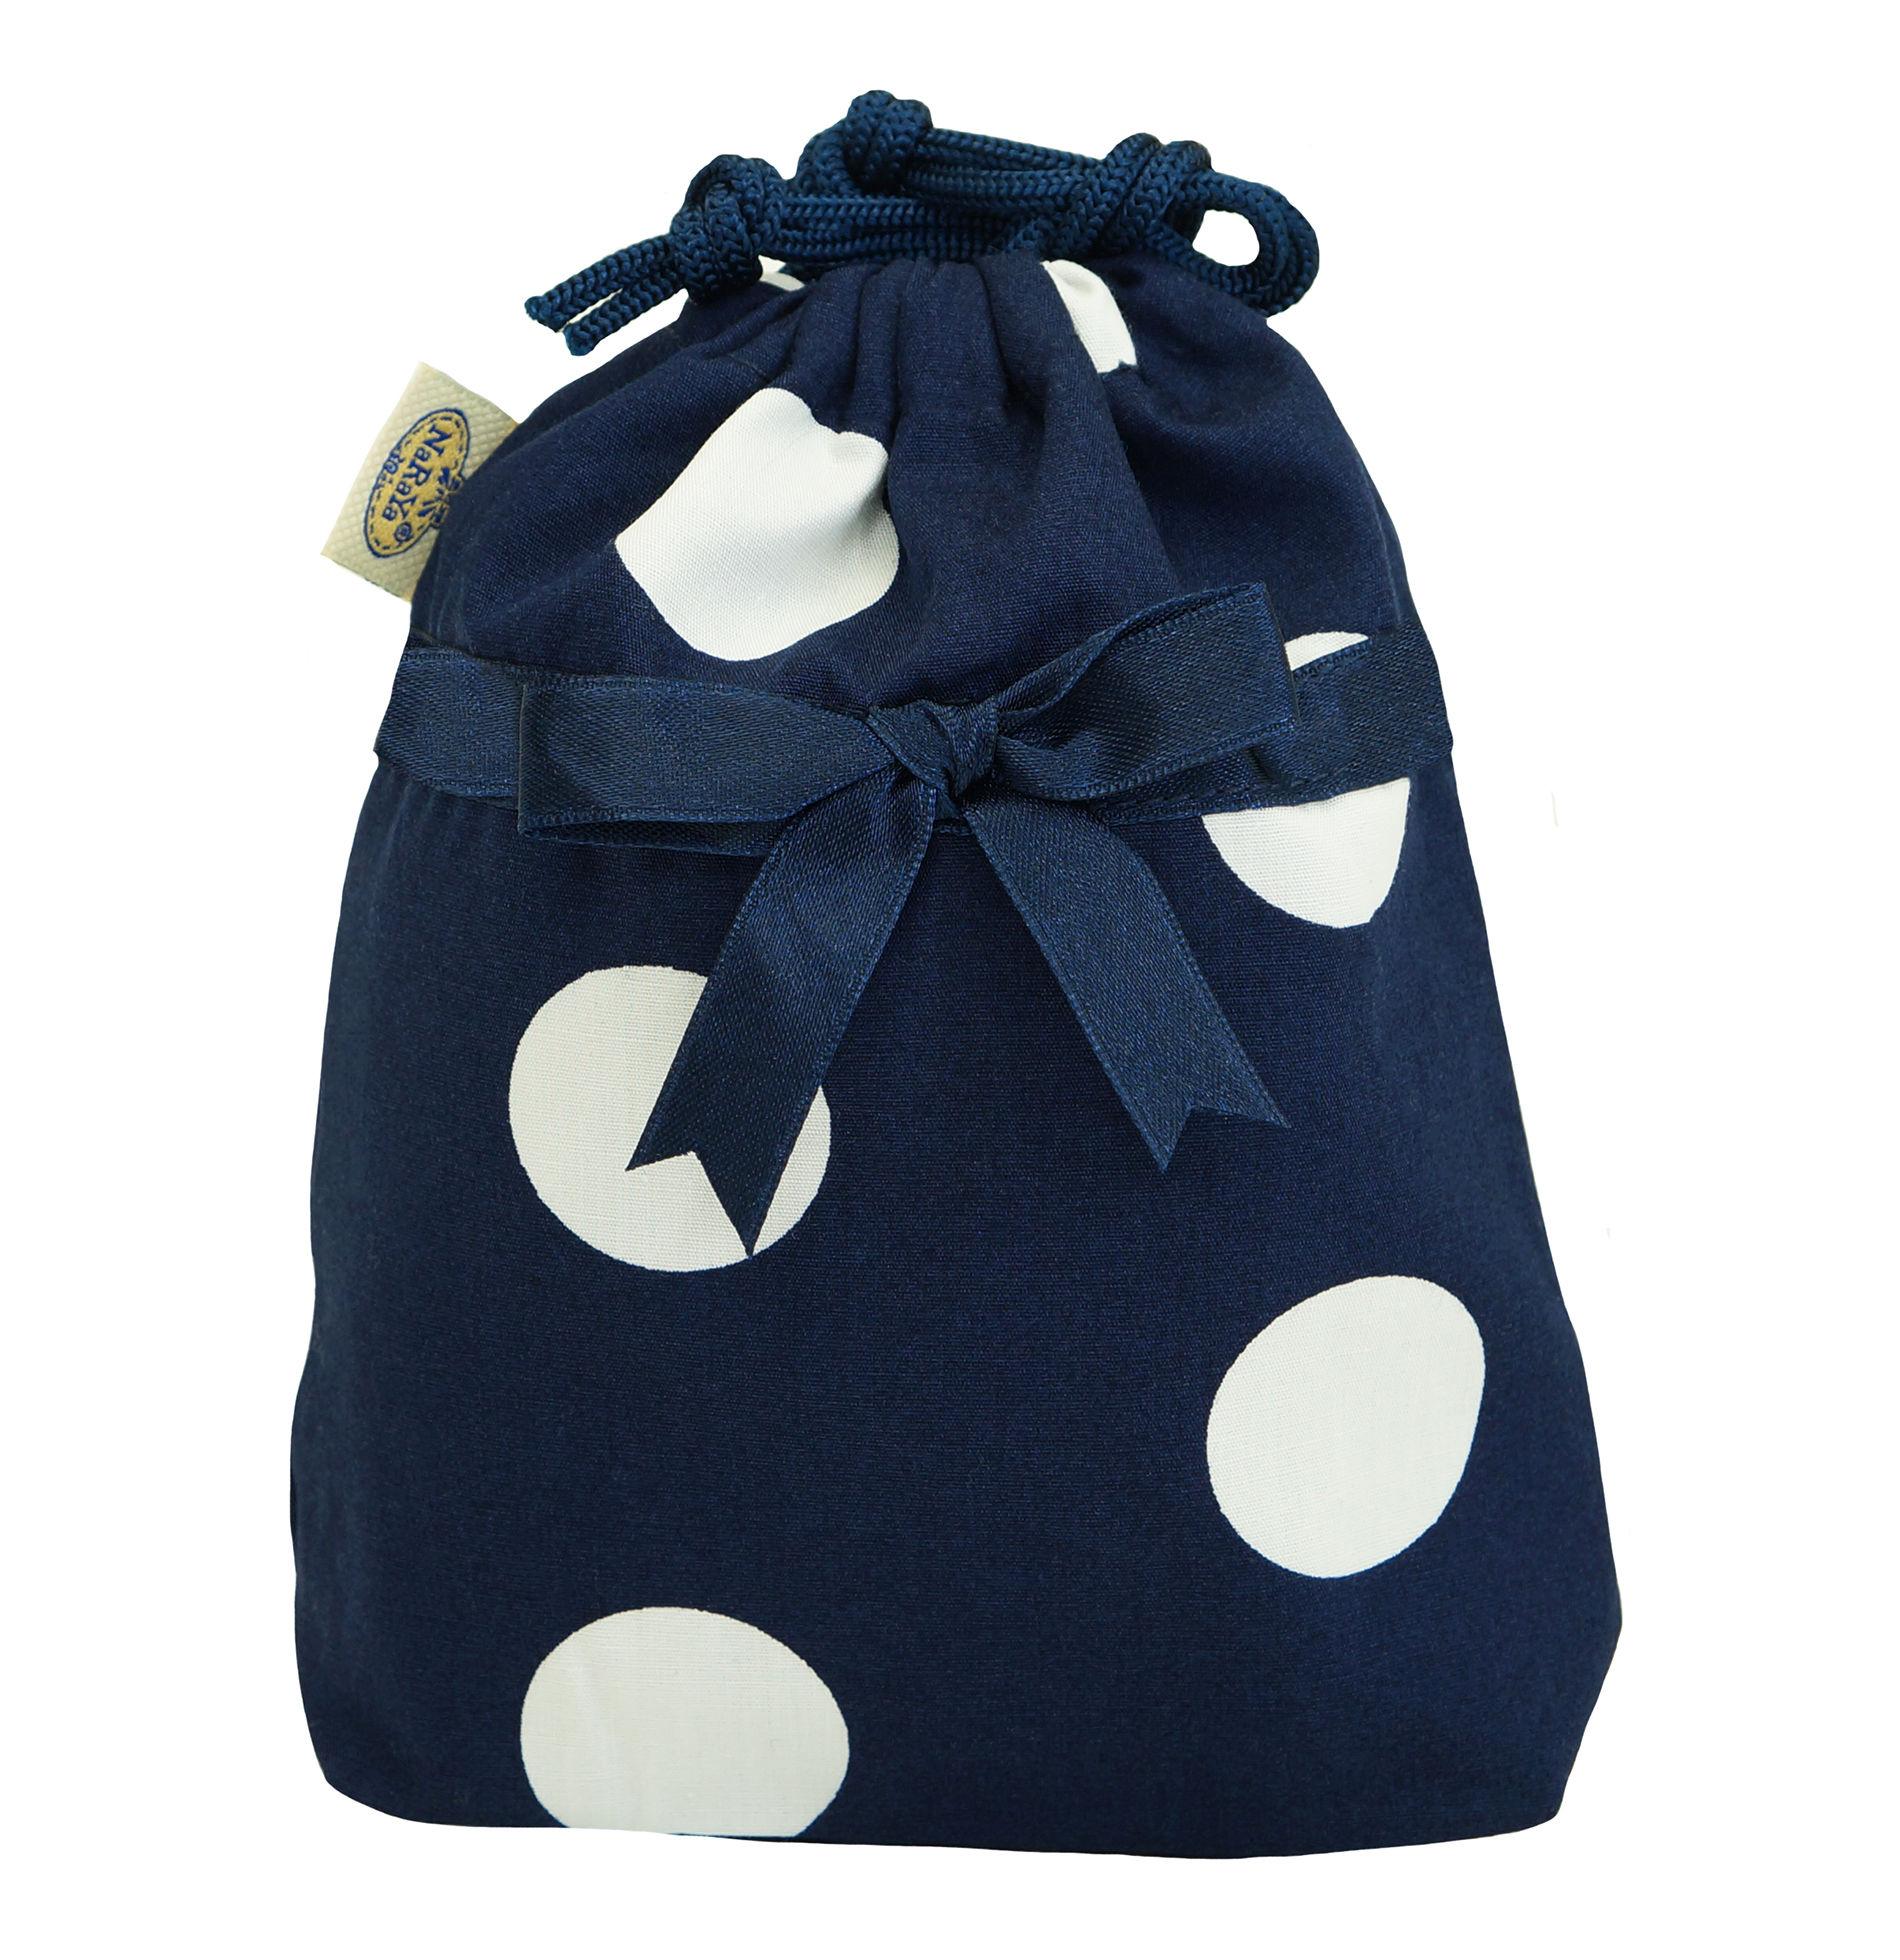 NaRaYa(ナラヤ) 巾着袋ポーチ(ランジェリーポーチ トラベルポーチ)・ドットネイビー(NB-258/S  )